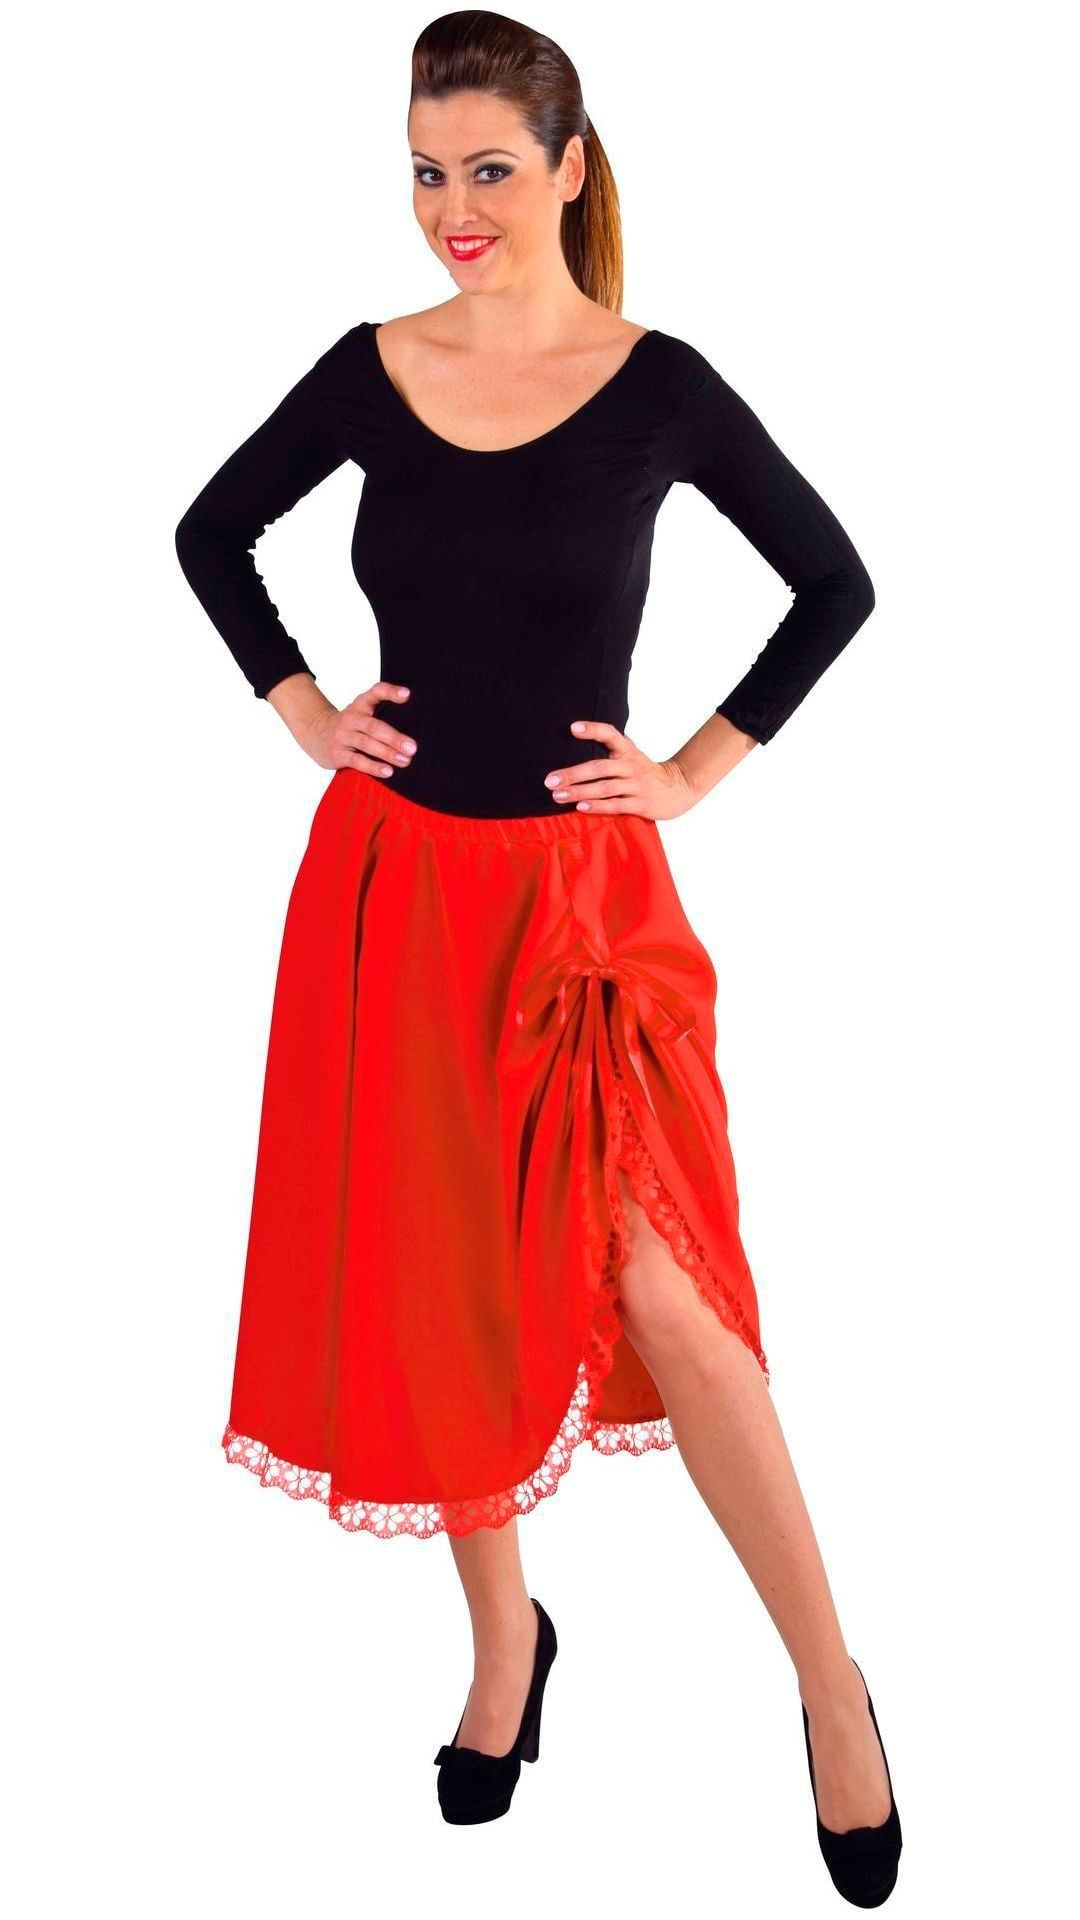 Rode rok met kant dames